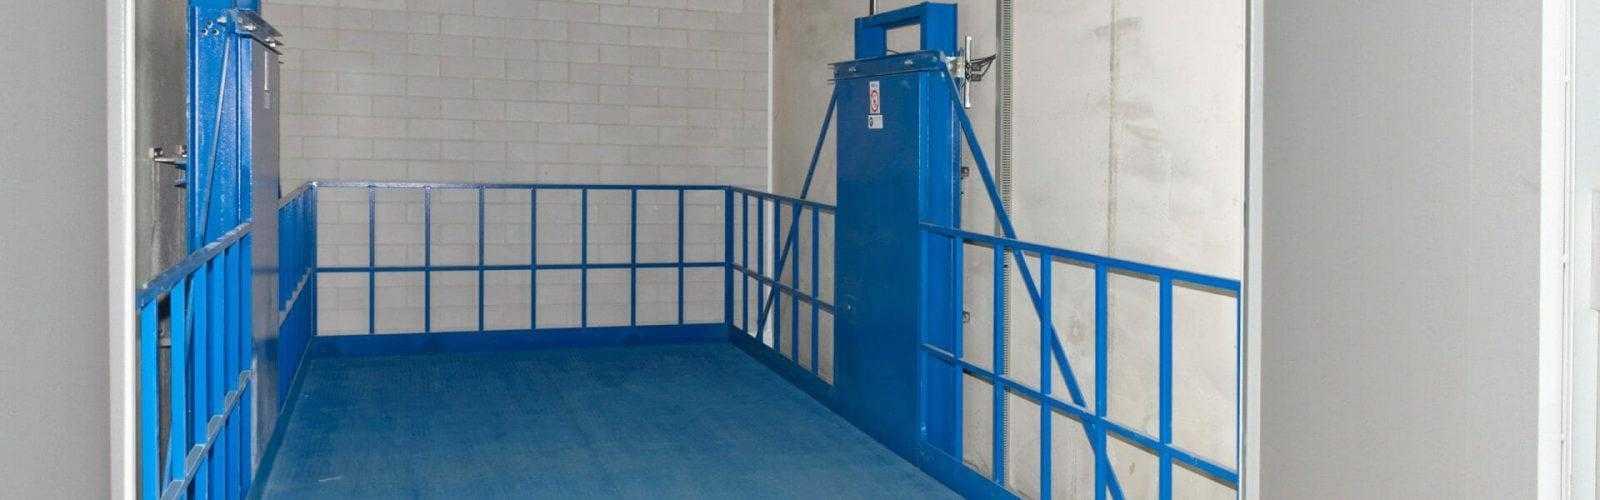 Goederenlift 5000 kg